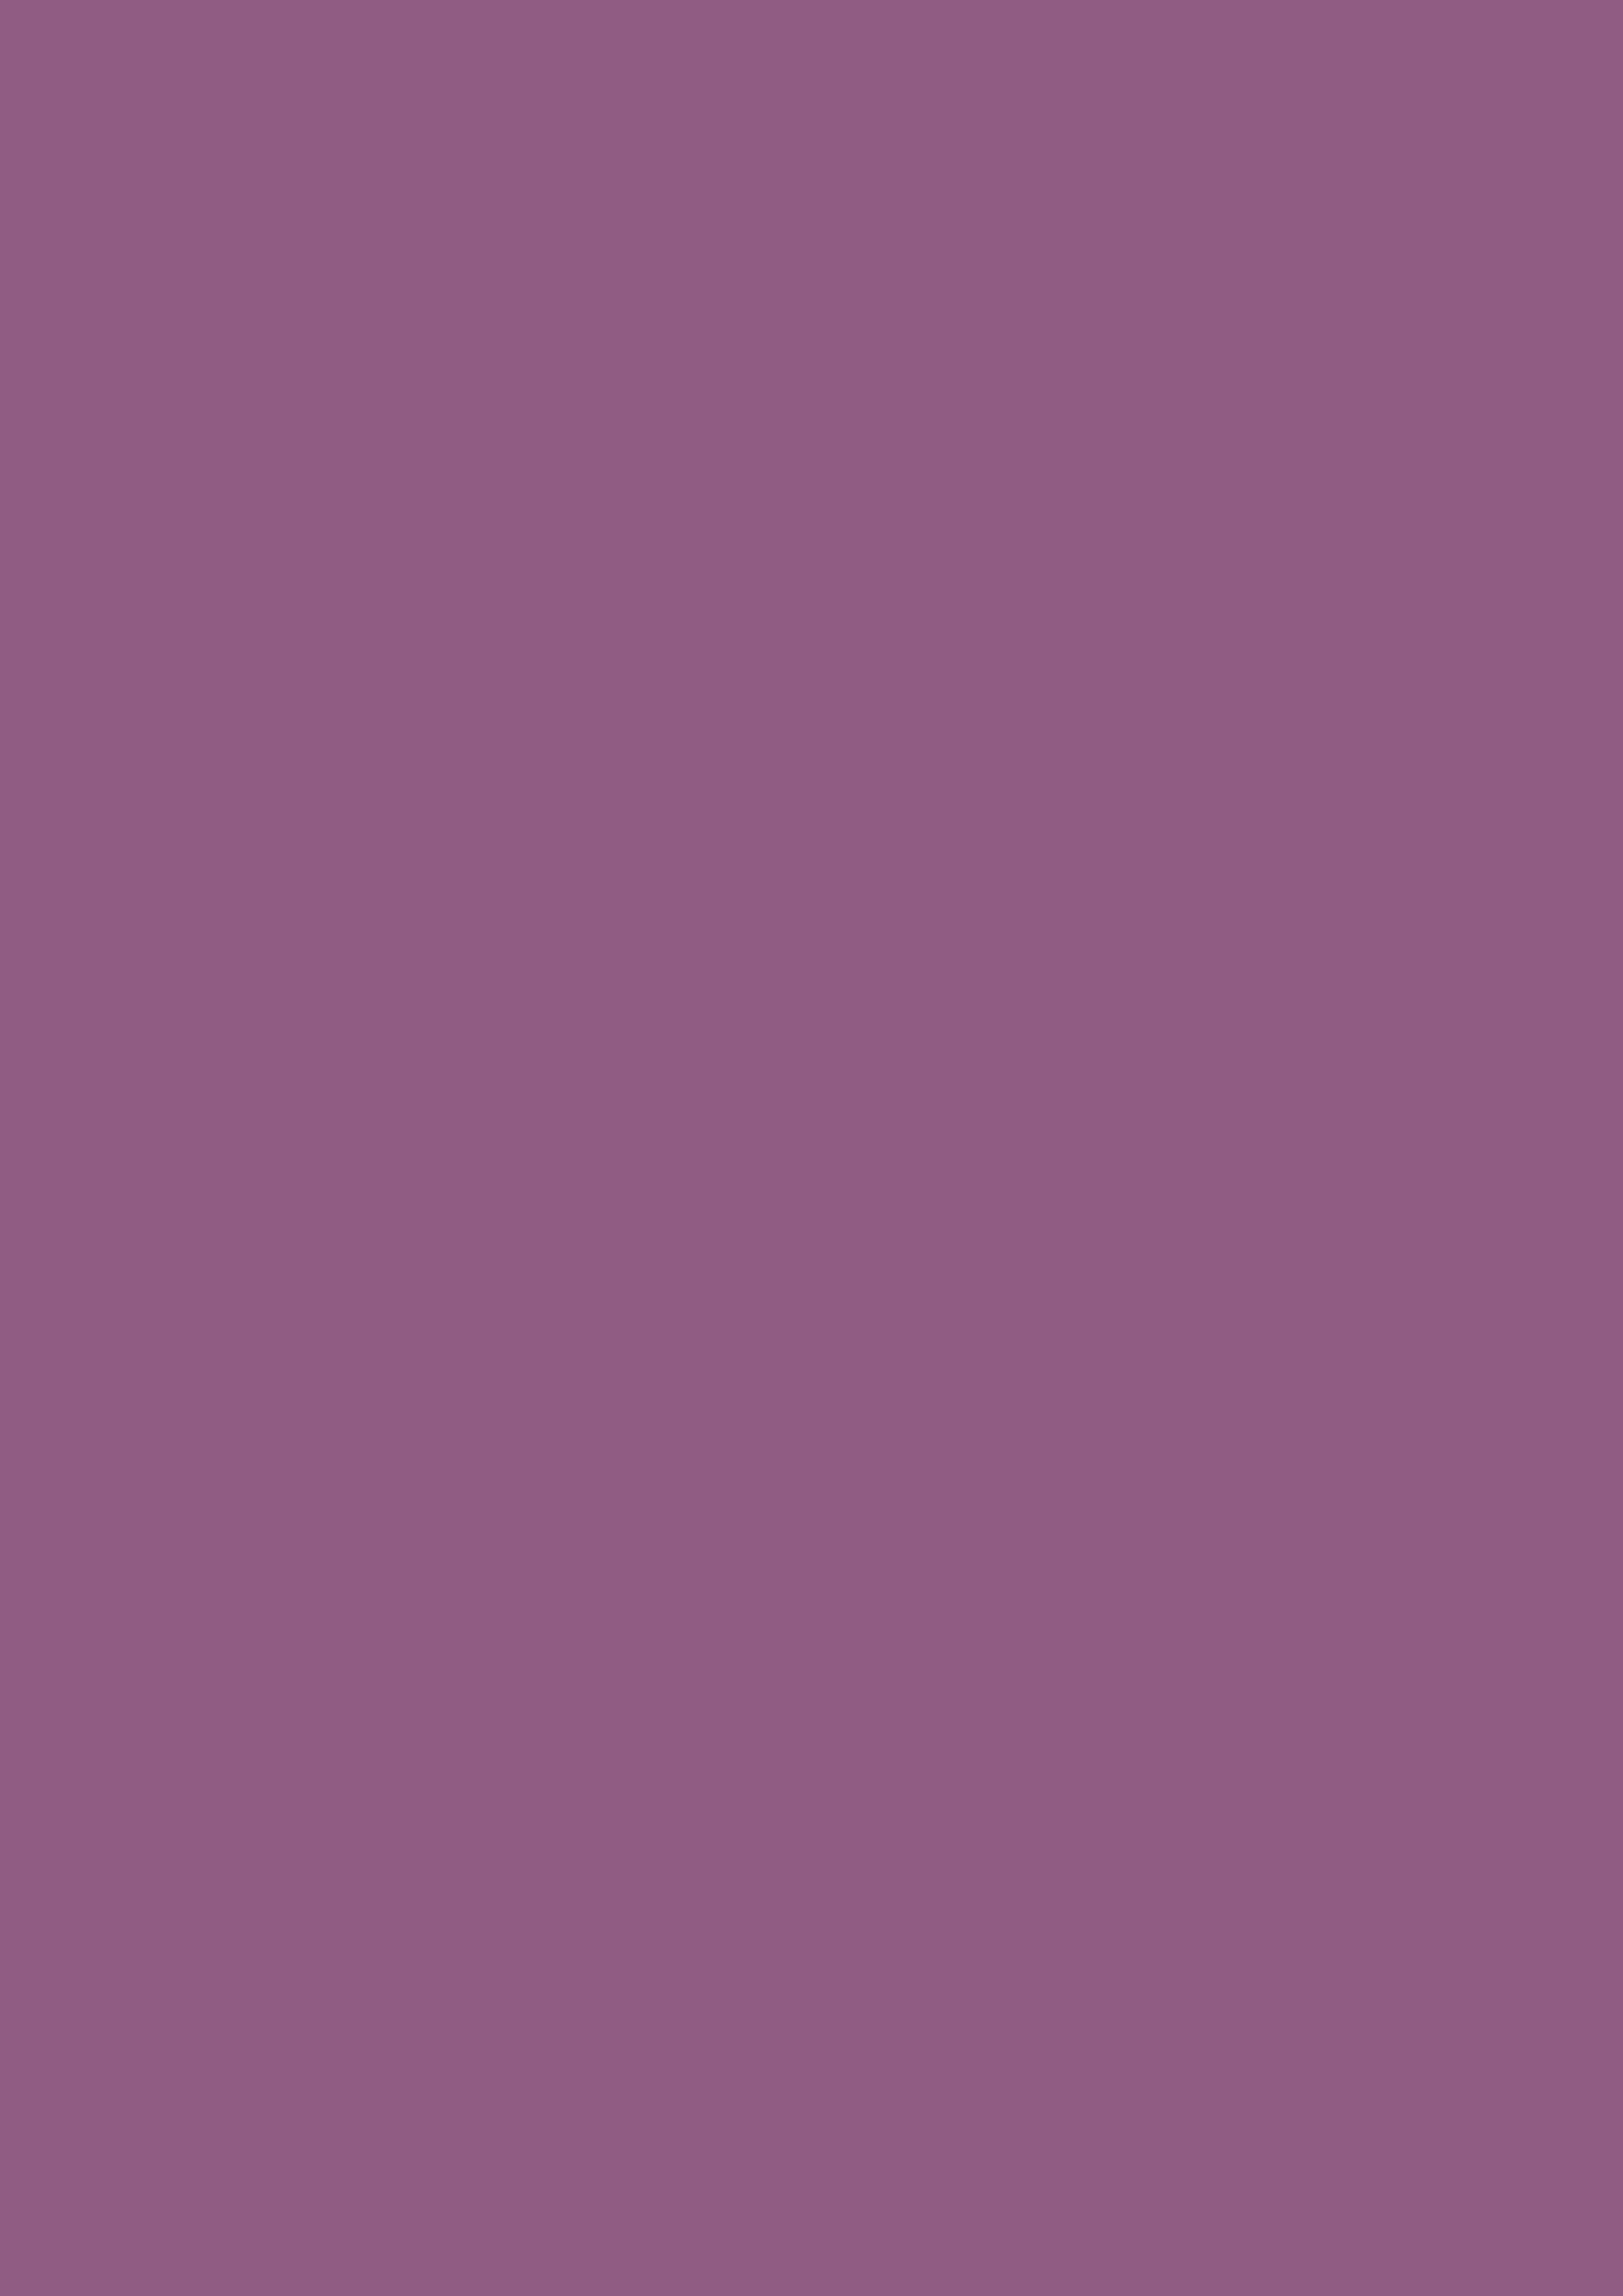 2480x3508 Antique Fuchsia Solid Color Background